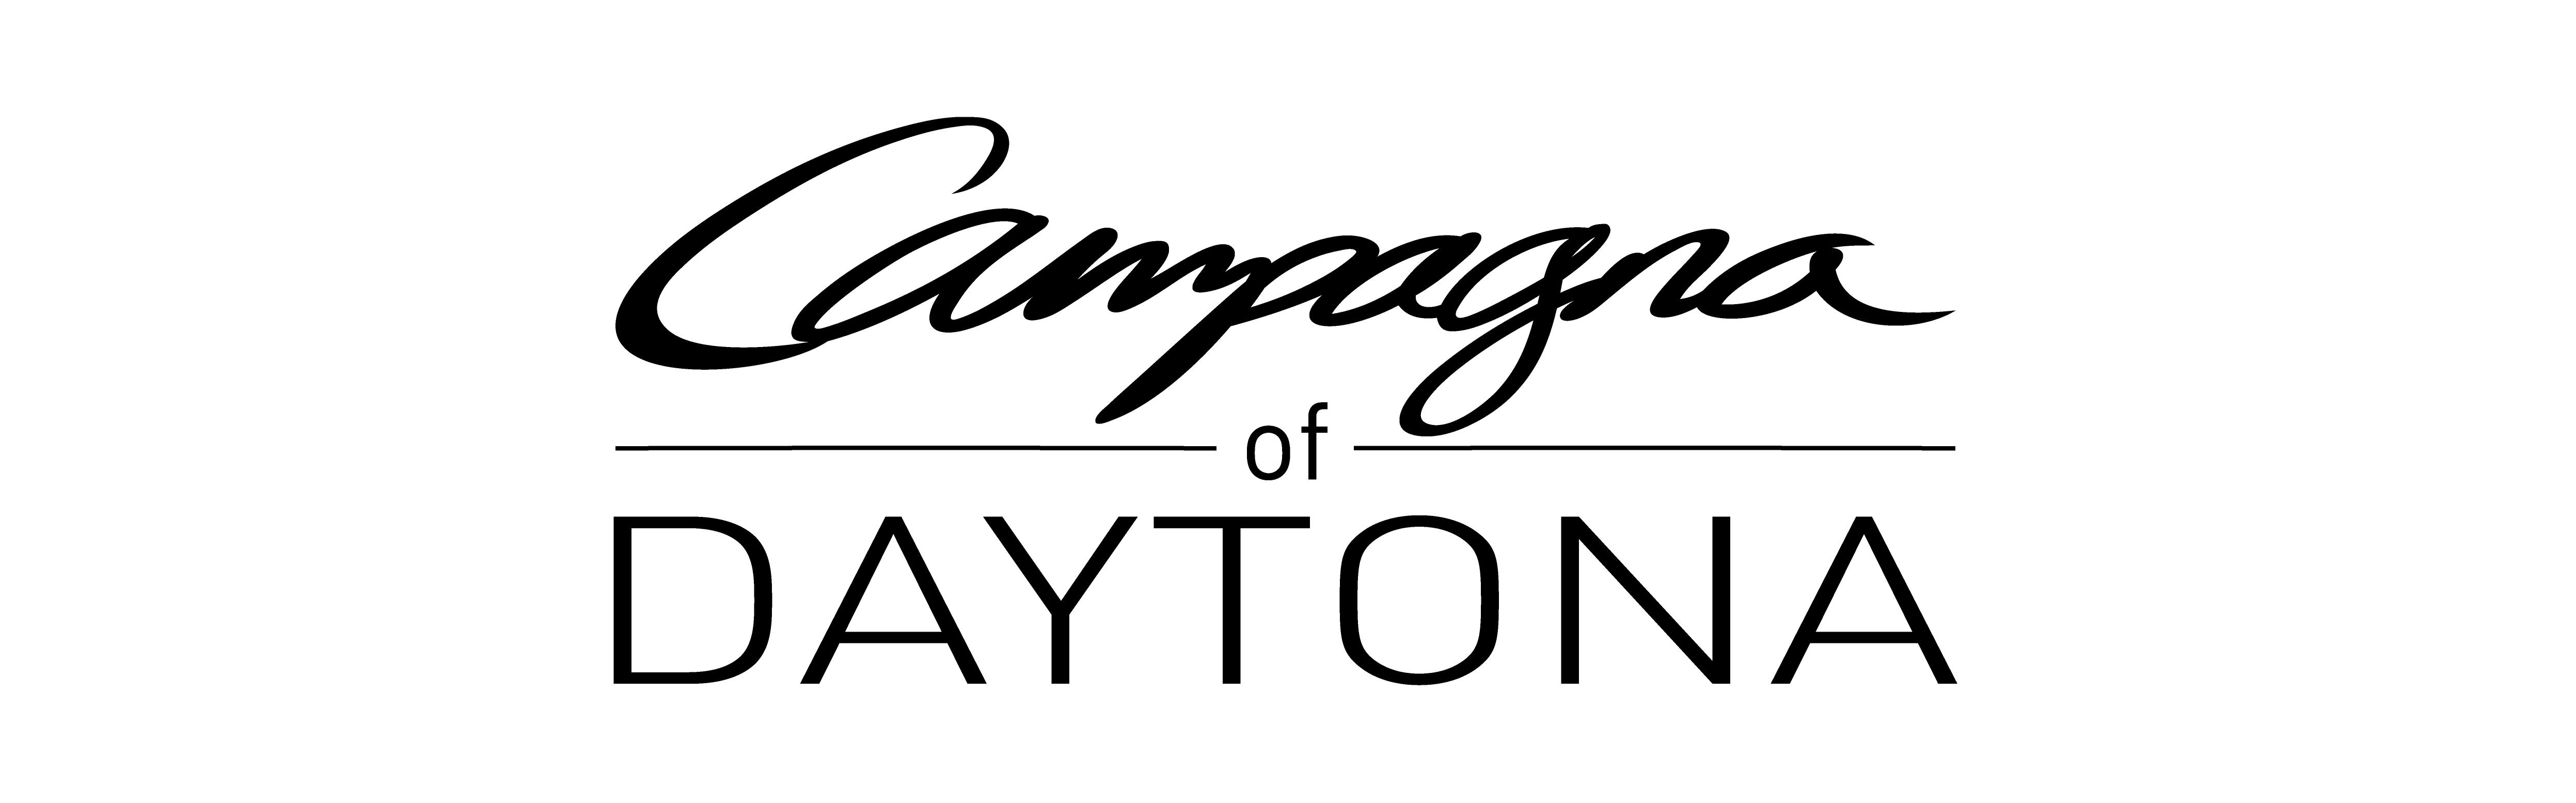 Signature-Campagna-Daytona-2019